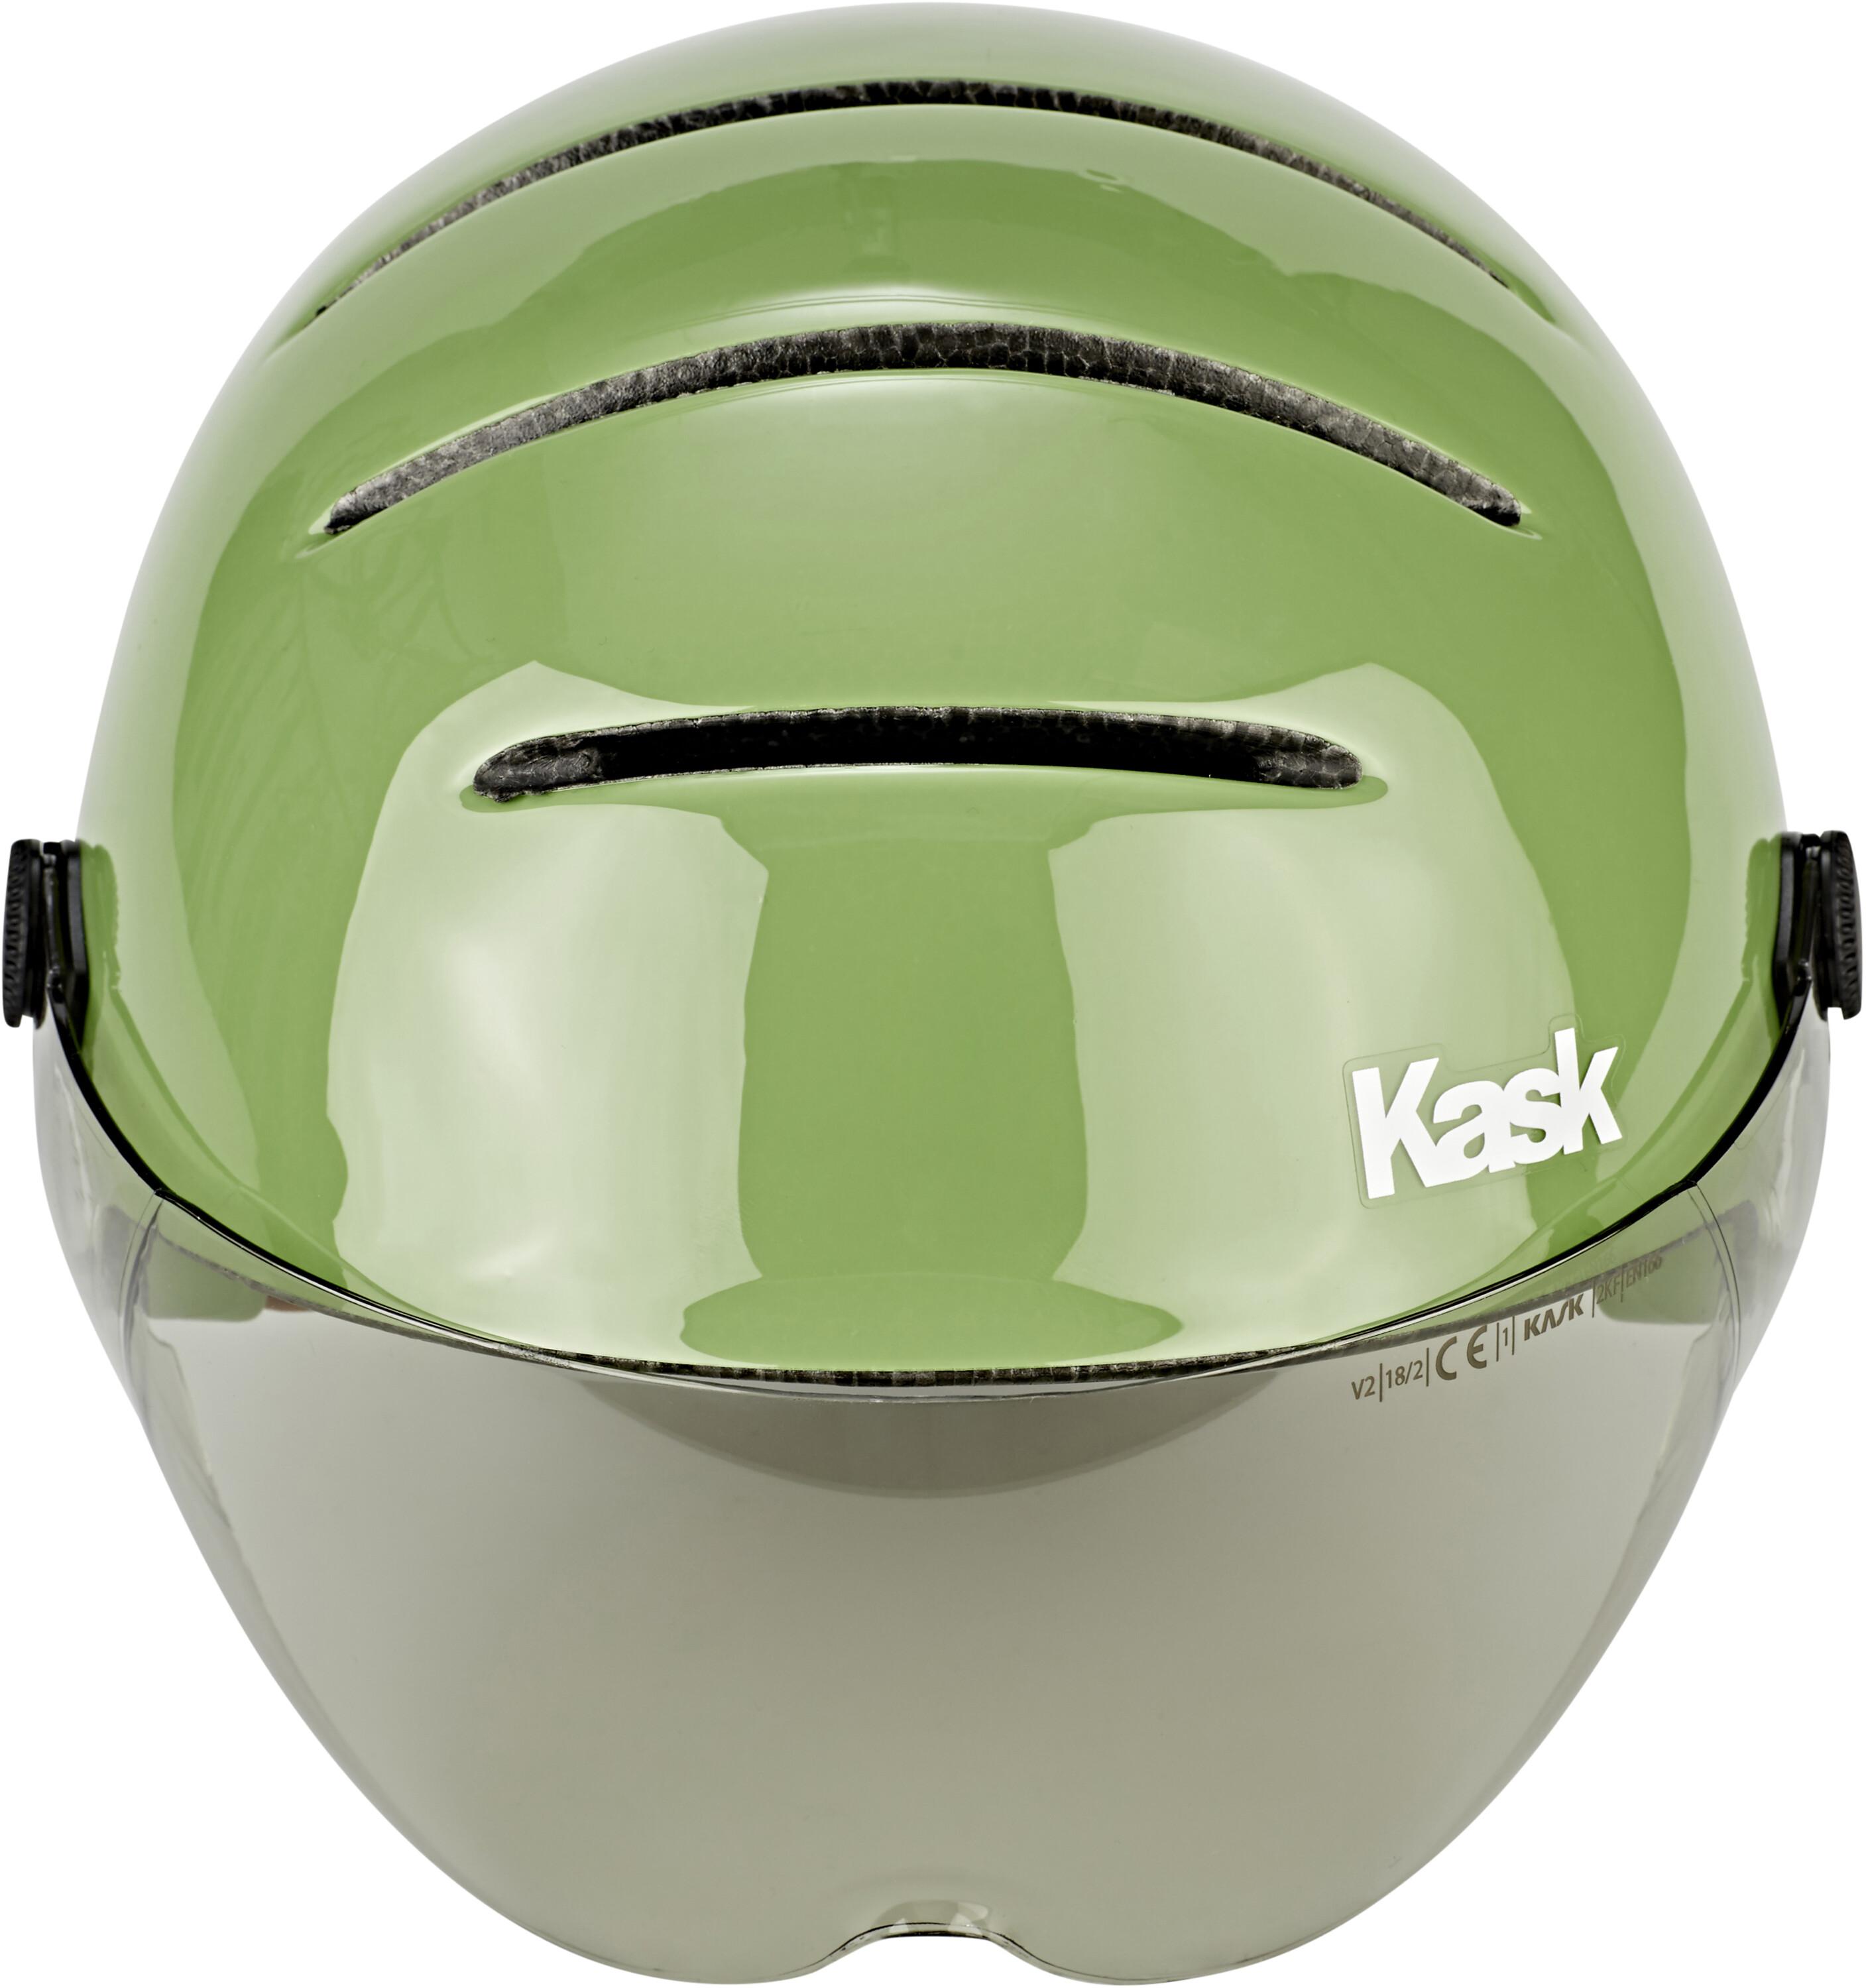 aeb4b21c699 Kask Lifestyle Bike Helmet incl. visor green at Bikester.co.uk